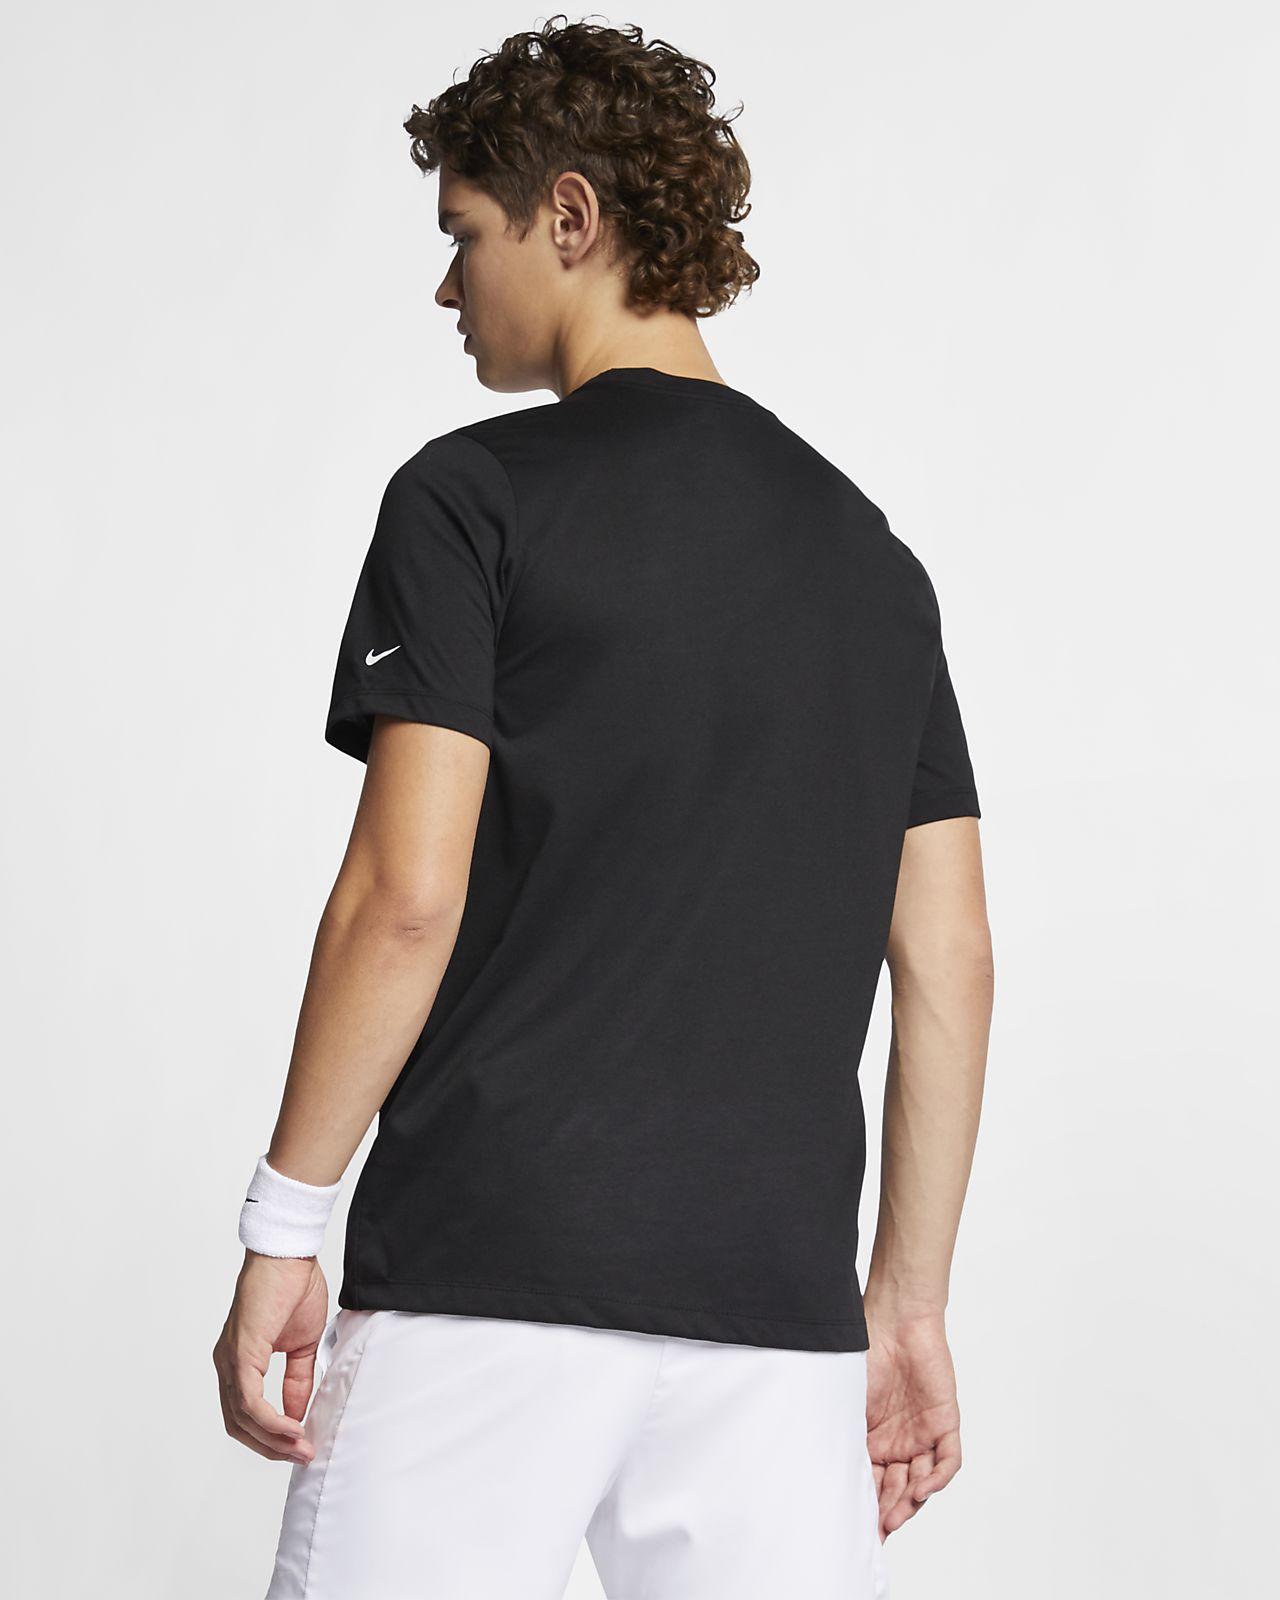 low priced e3e37 c1c8e ... Tennis-t-shirt NikeCourt Dri-FIT Rafa för män